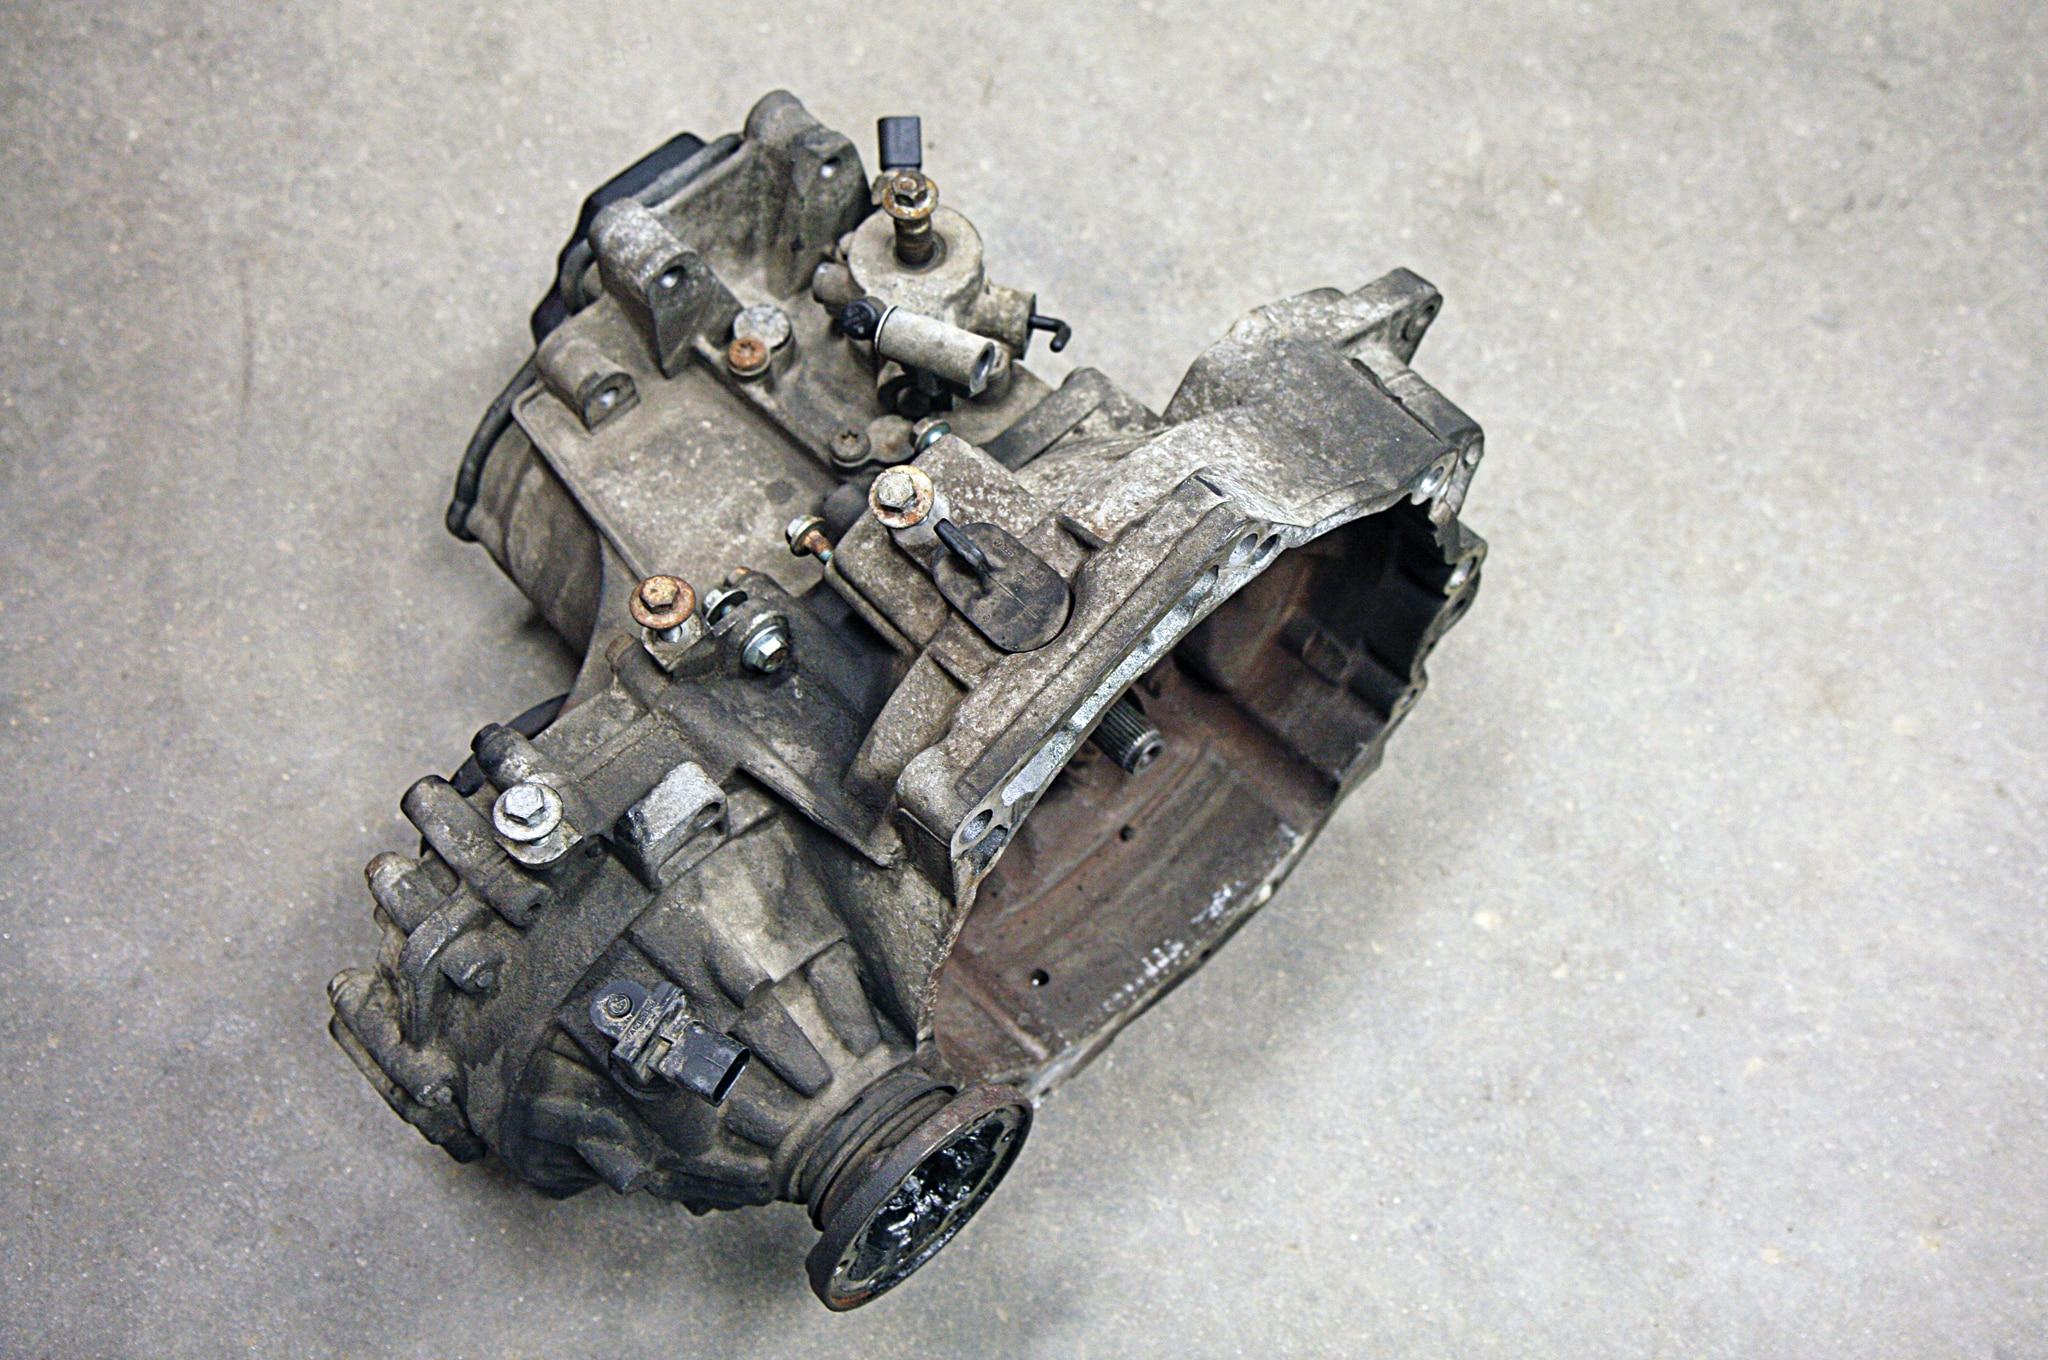 medium resolution of 2002 volkswagen jetta tdi stock auto transmission view photo gallery 13 photos